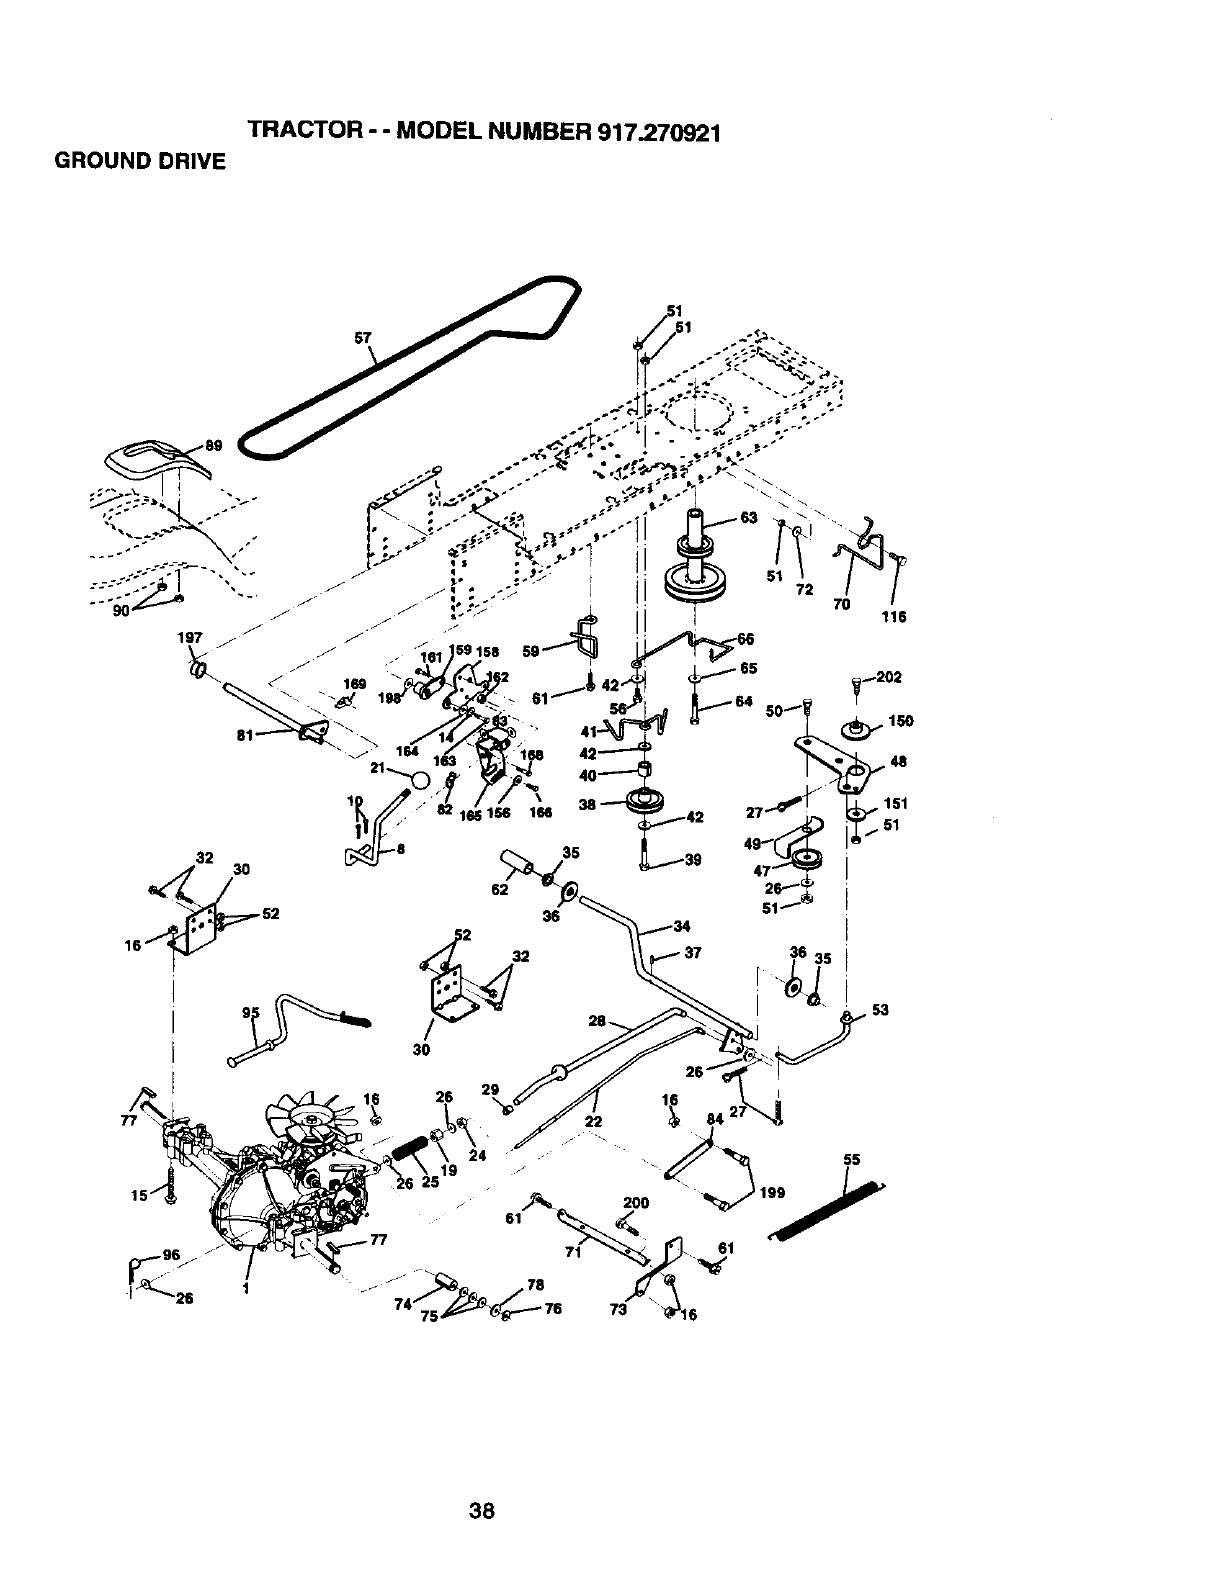 Craftsman 917270921 User Manual 19.5HP AUTOMATIC LAWN